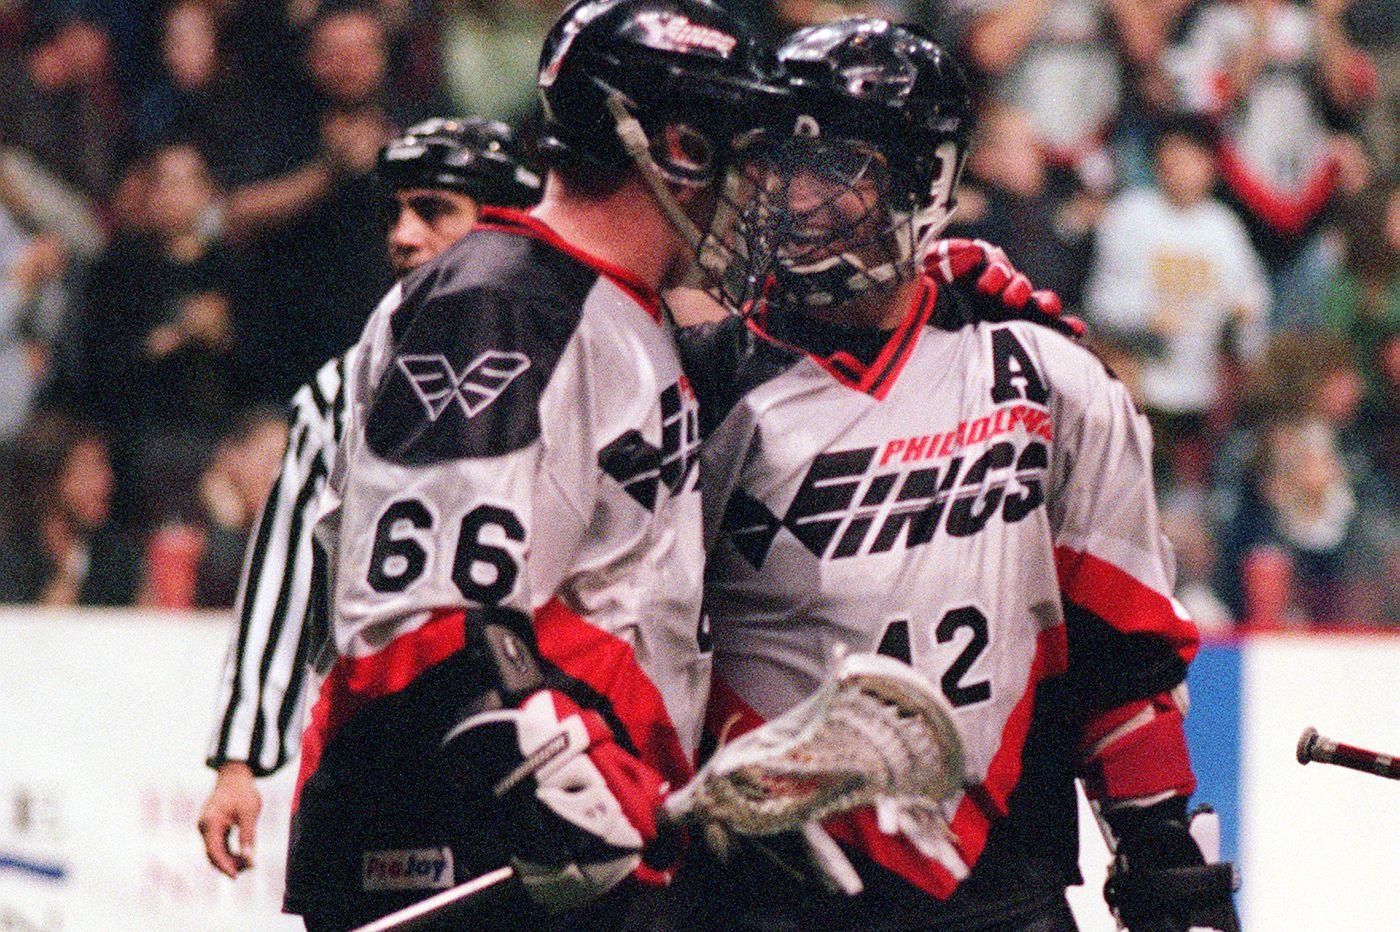 Wings honor former standout players Tom Marechek and Jake Bergey as lacrosse season opens